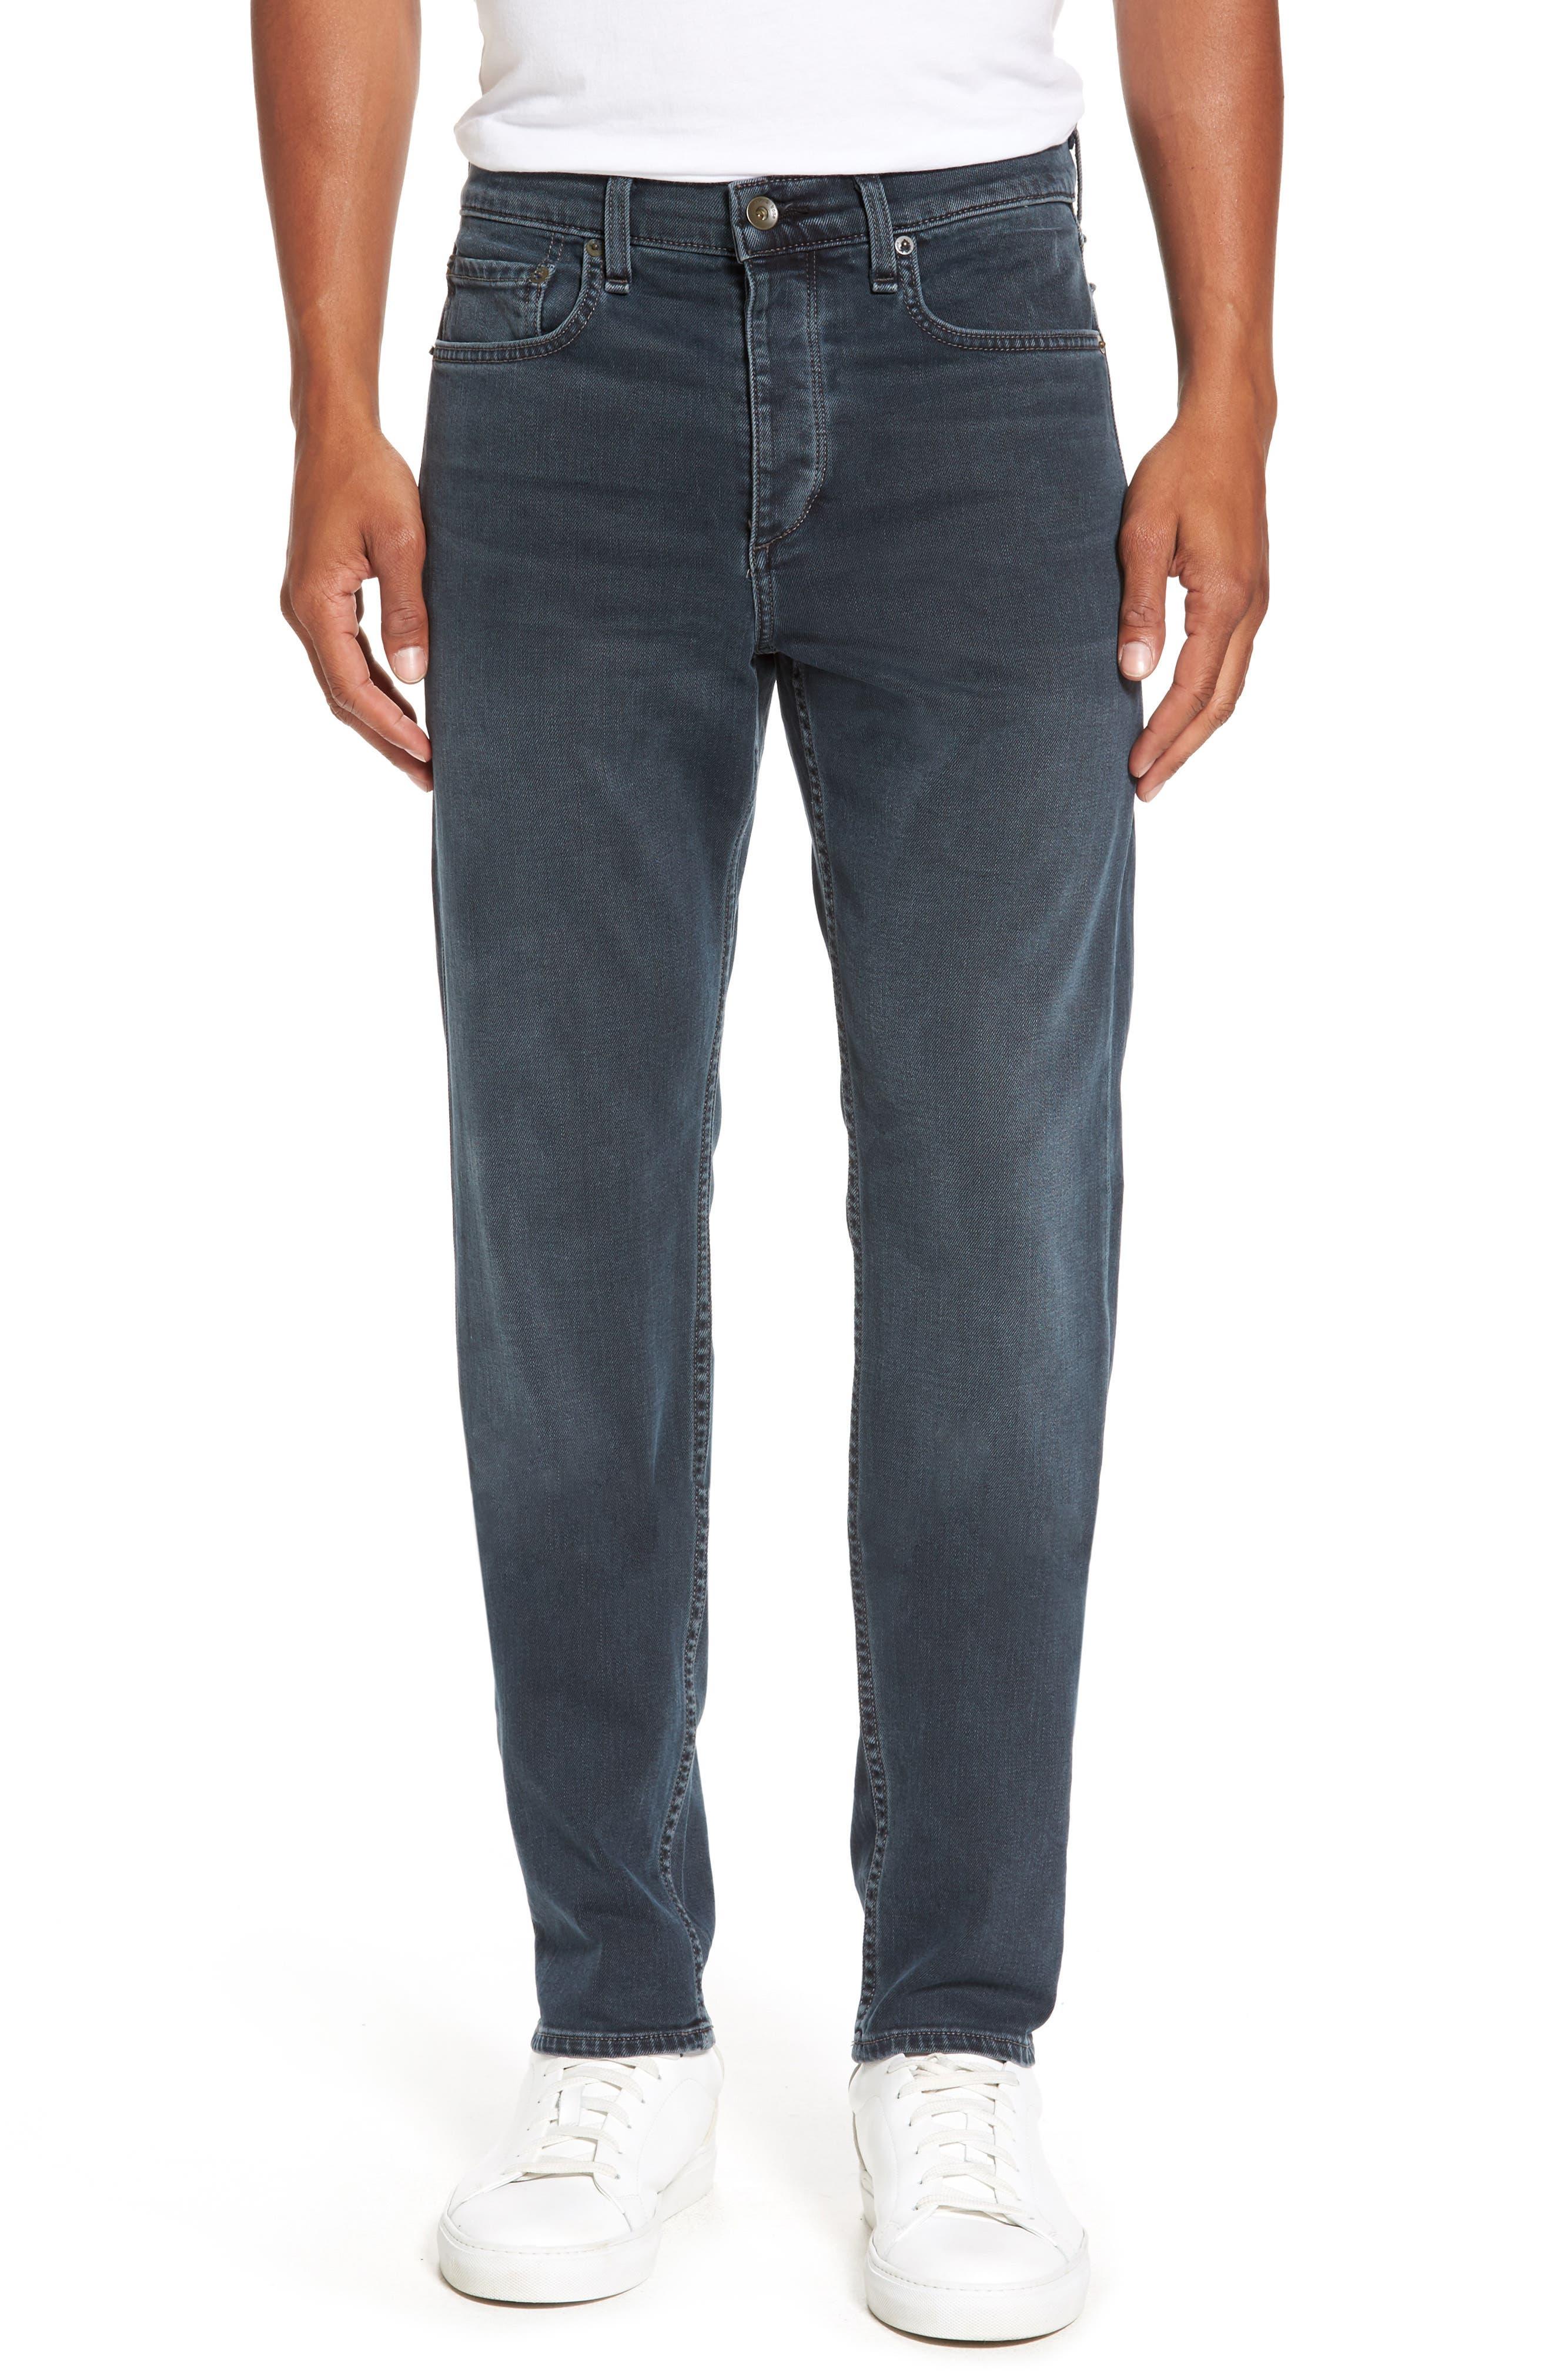 Men's Rag & Bone Fit 2 Slim Fit Jeans,  31 - Blue